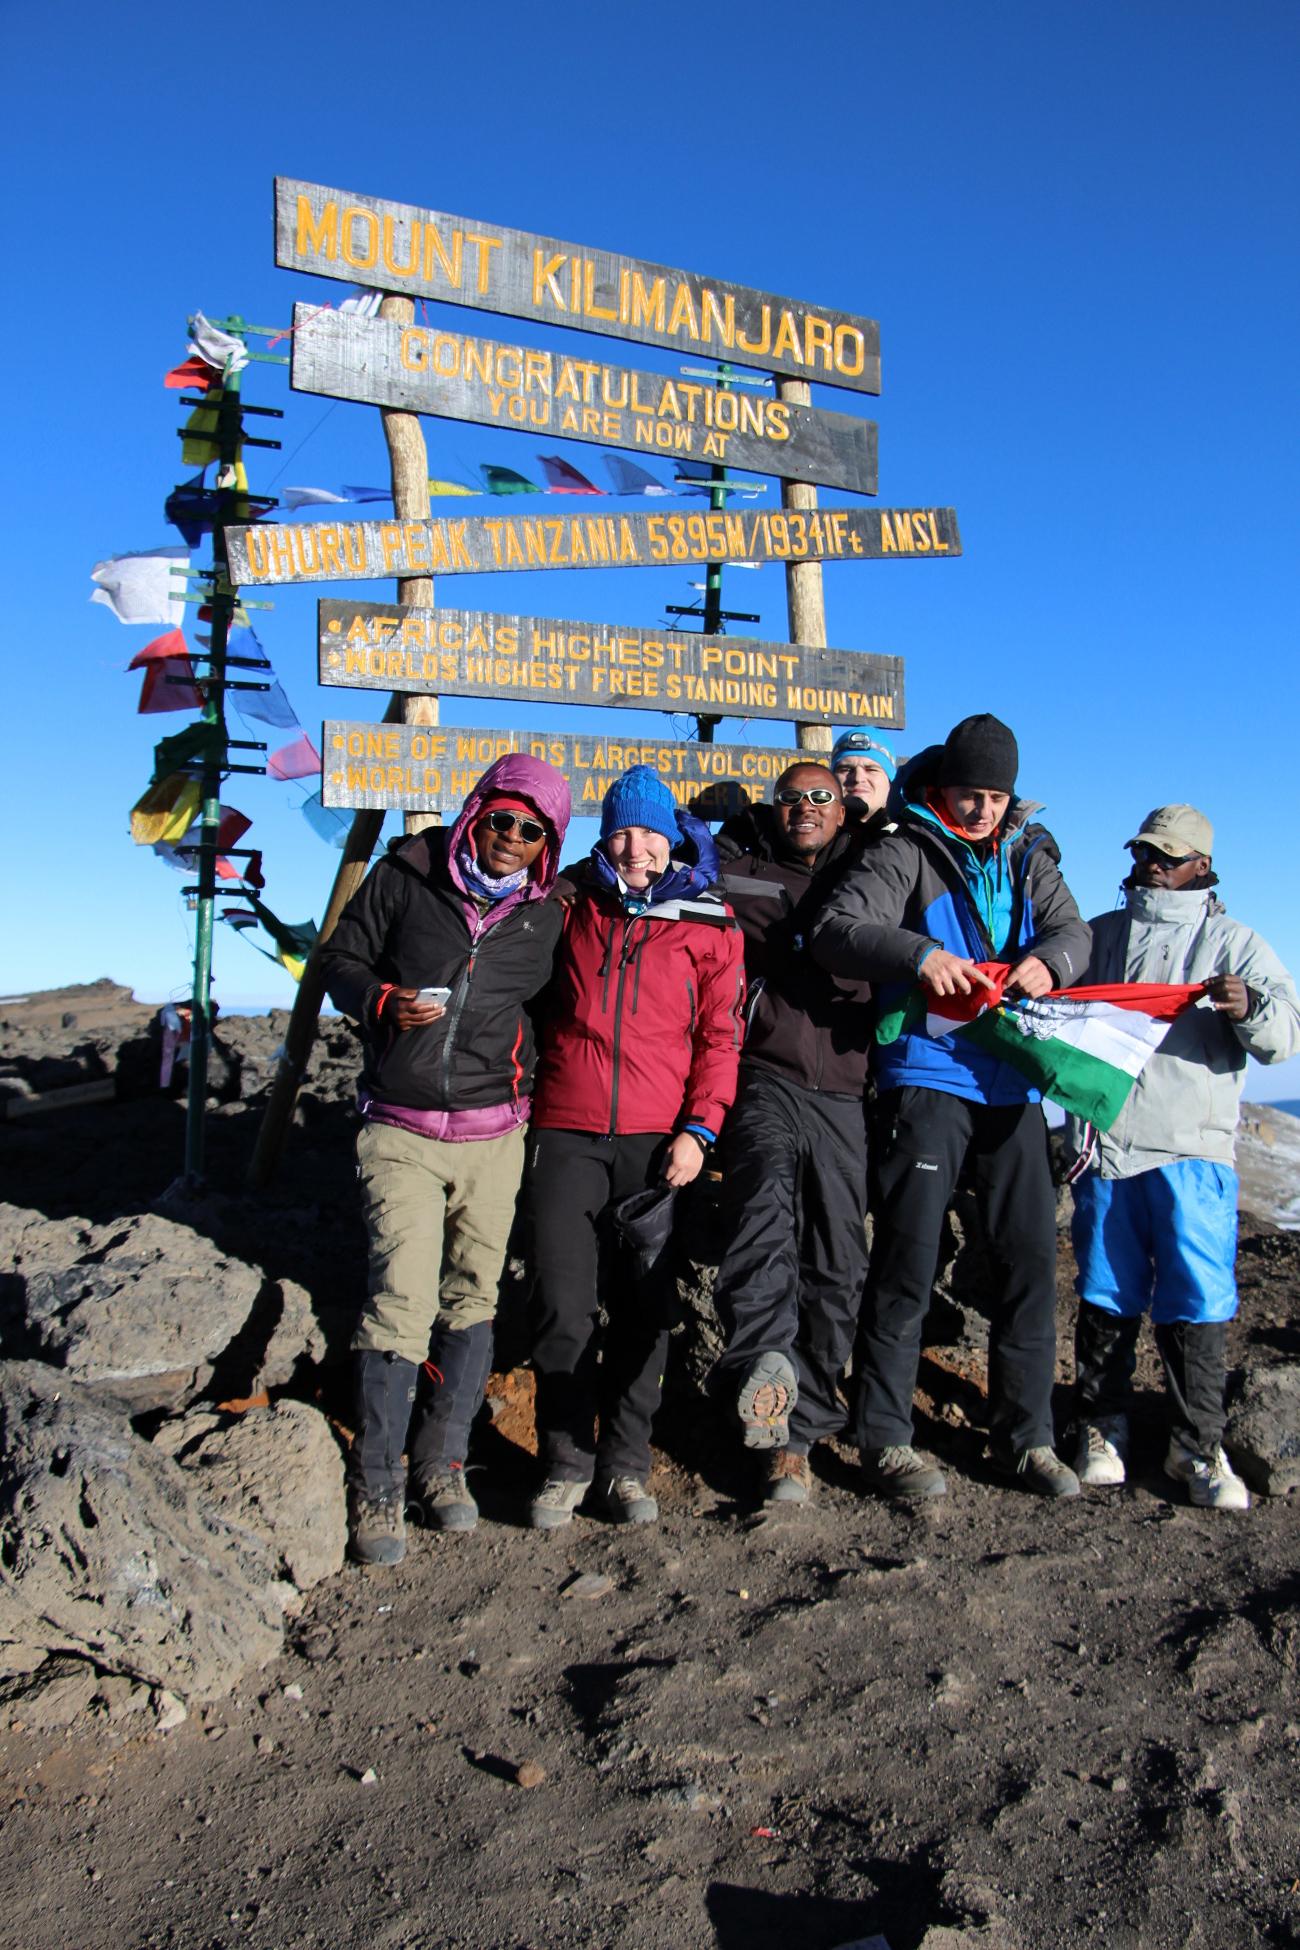 kilimanjaro_peak